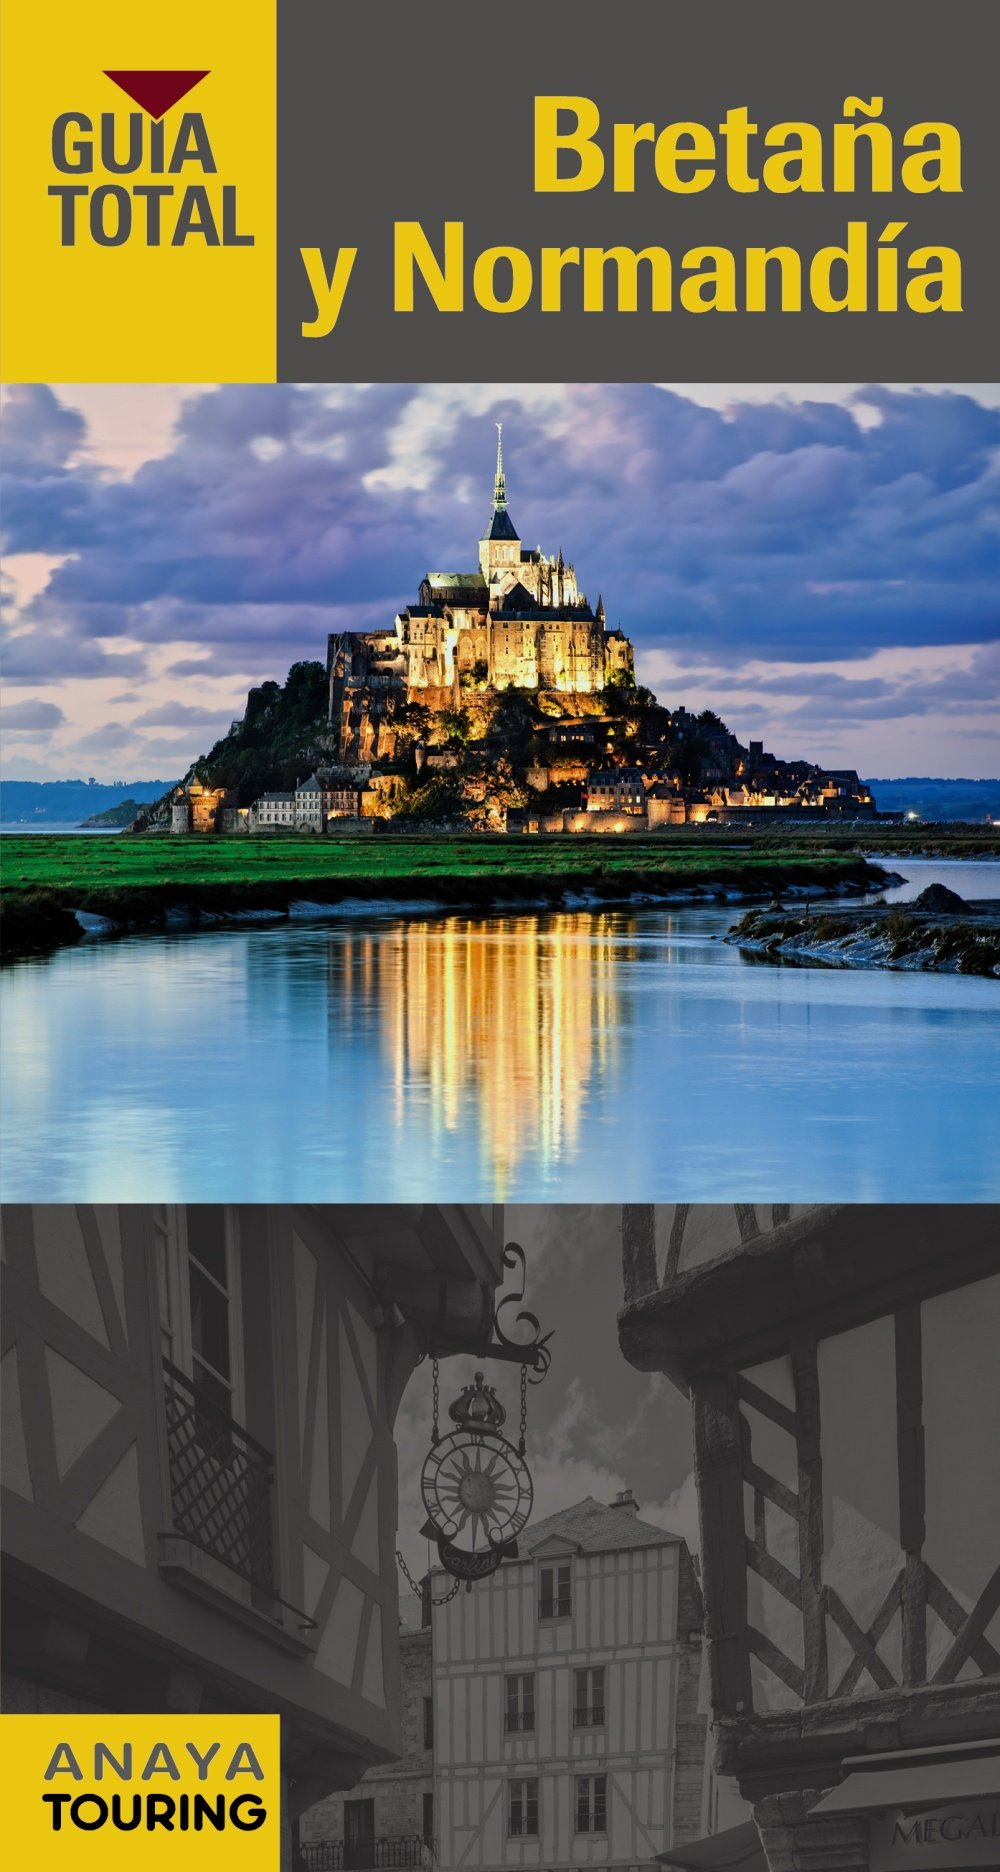 Bretaña y Normandía (Guía Total - Internacional) Tapa blanda – 25 feb 2016 Anaya Touring Touring Editore 8499357636 France